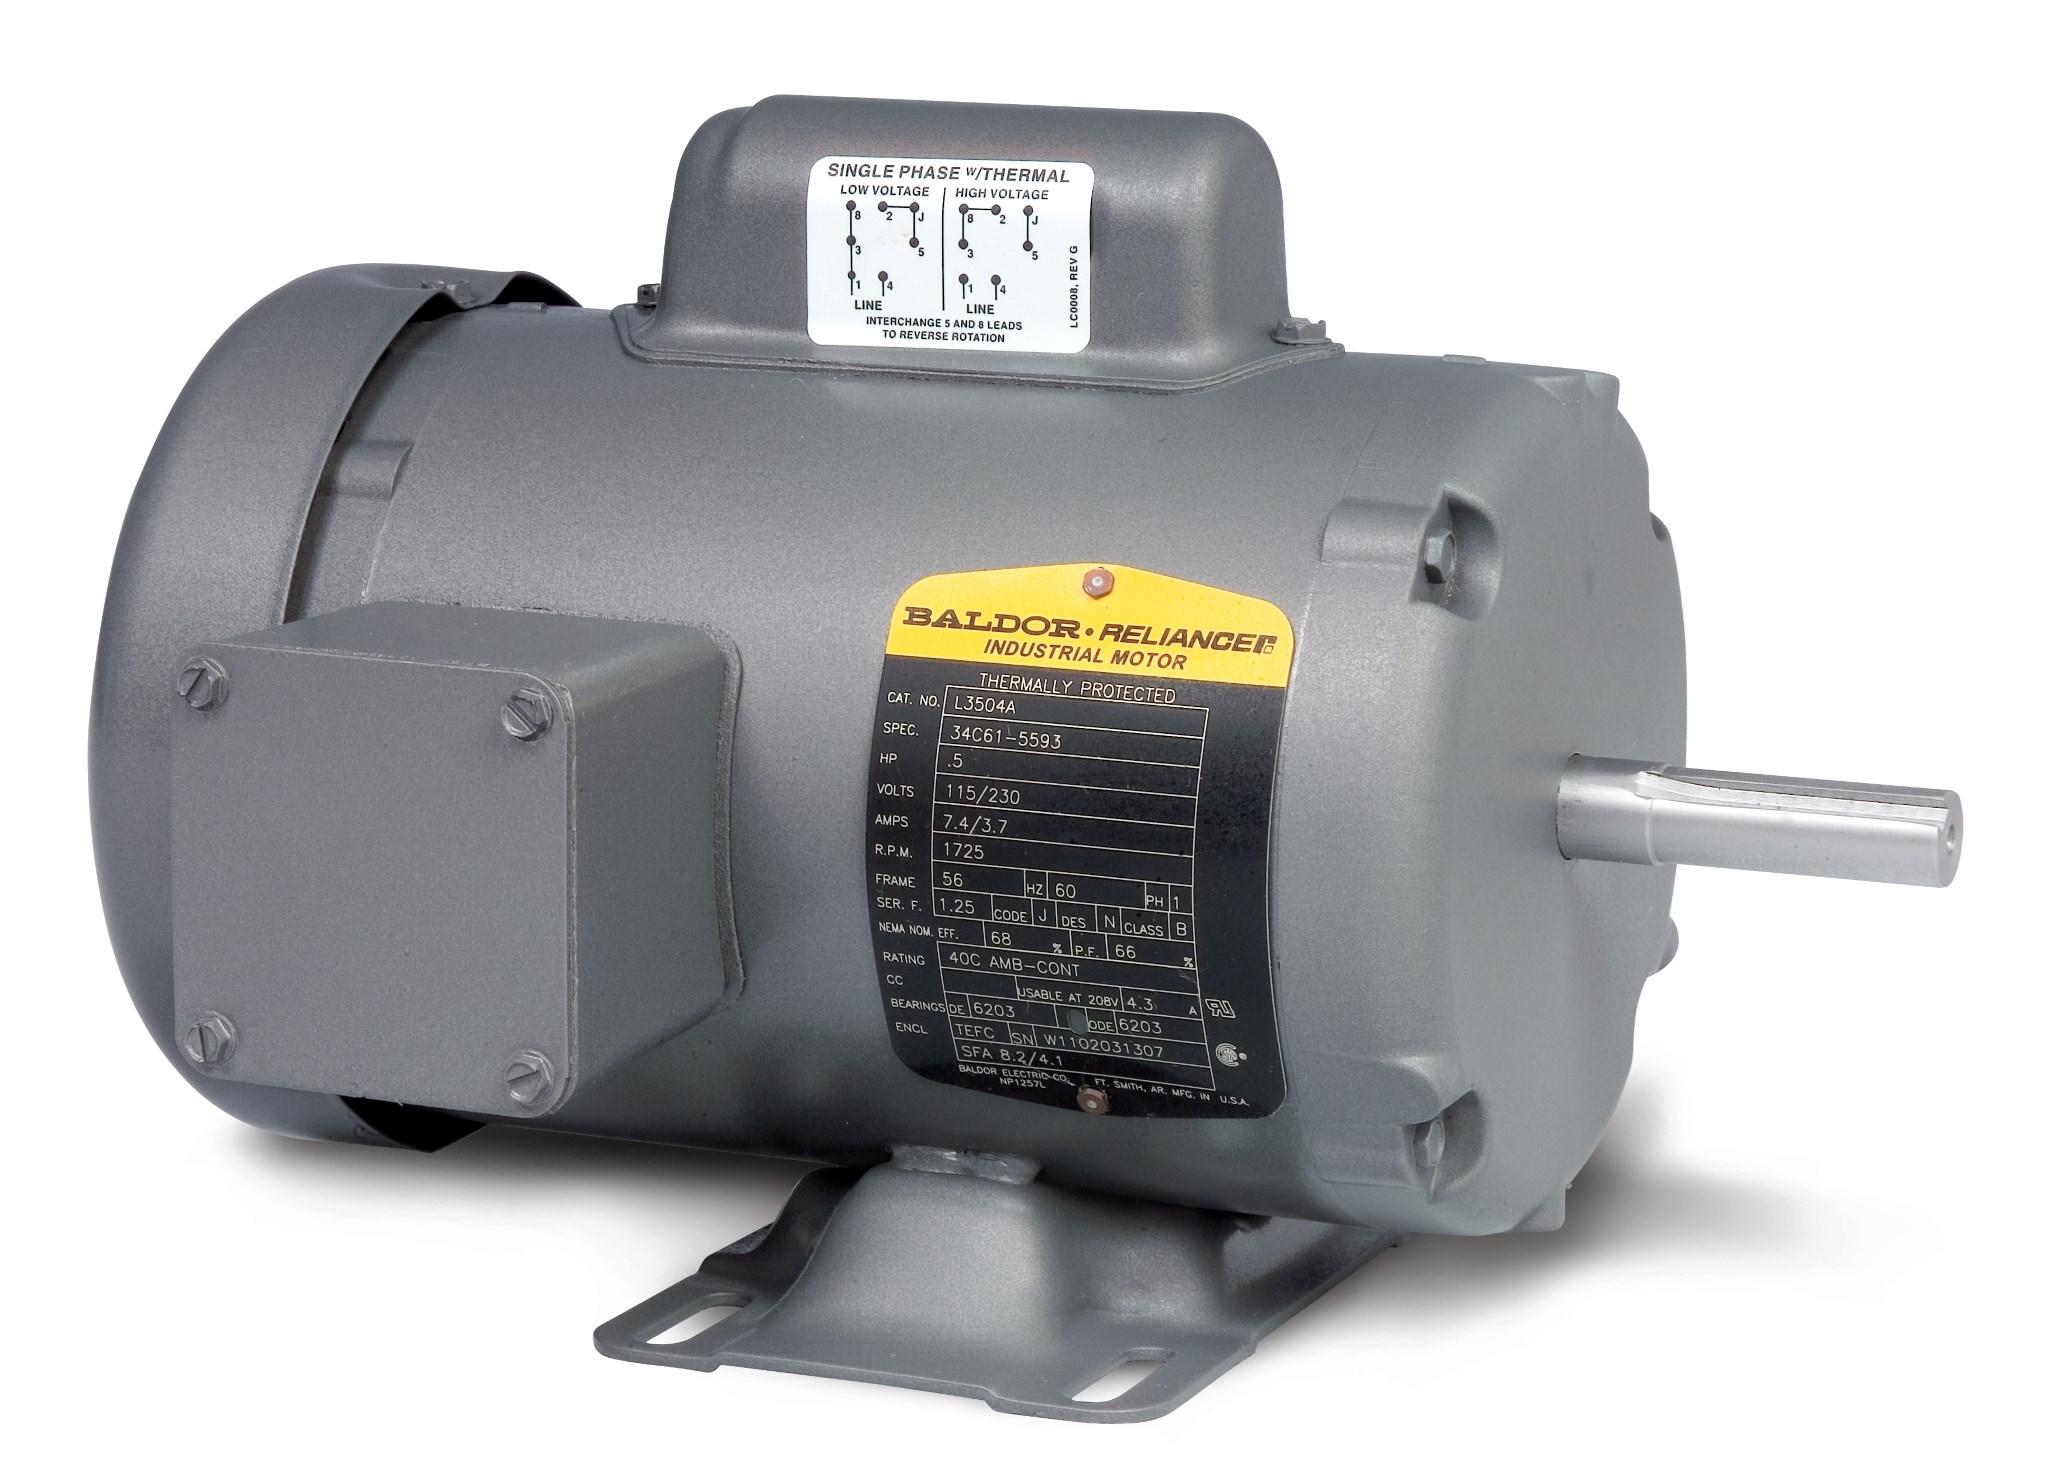 3510 Baldor Motor Wiring Diagram Master Blogs Chevrolet Tacuma L3510 Product Catalog Com Rh Reliance Motors Electric Diagrams